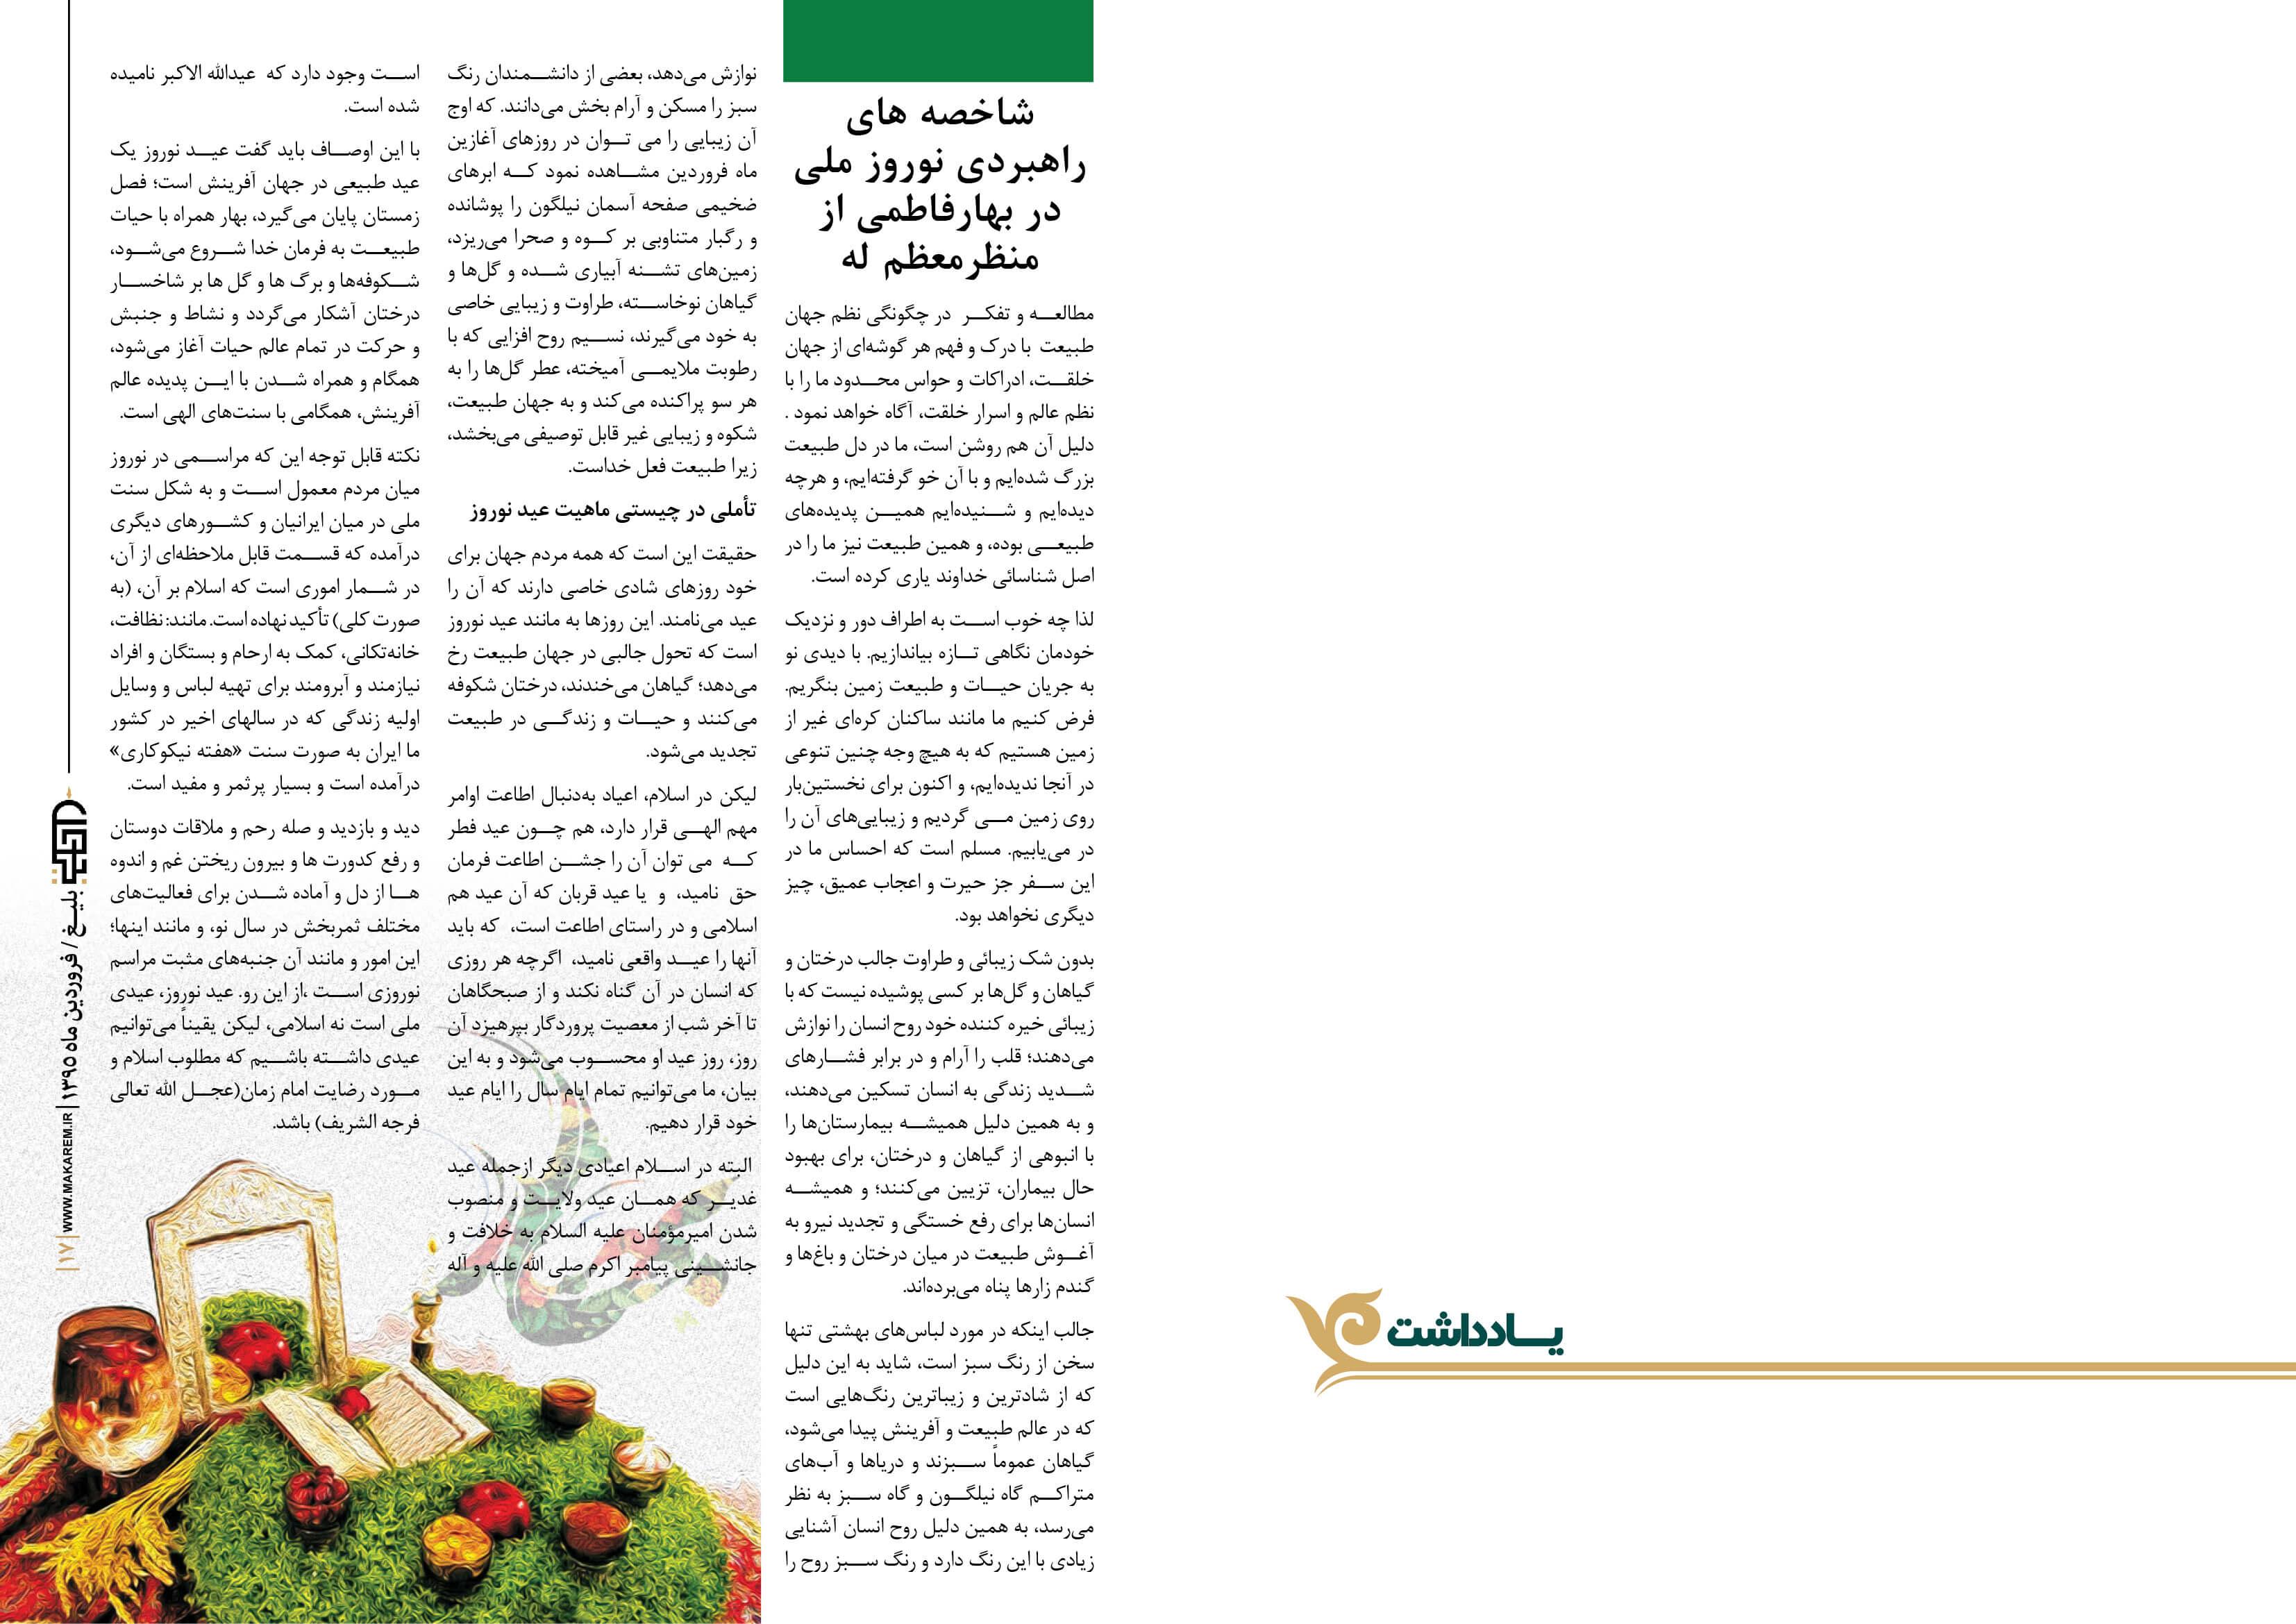 بلیغ 09-مدرسه الامام امیر المومنین (ع)